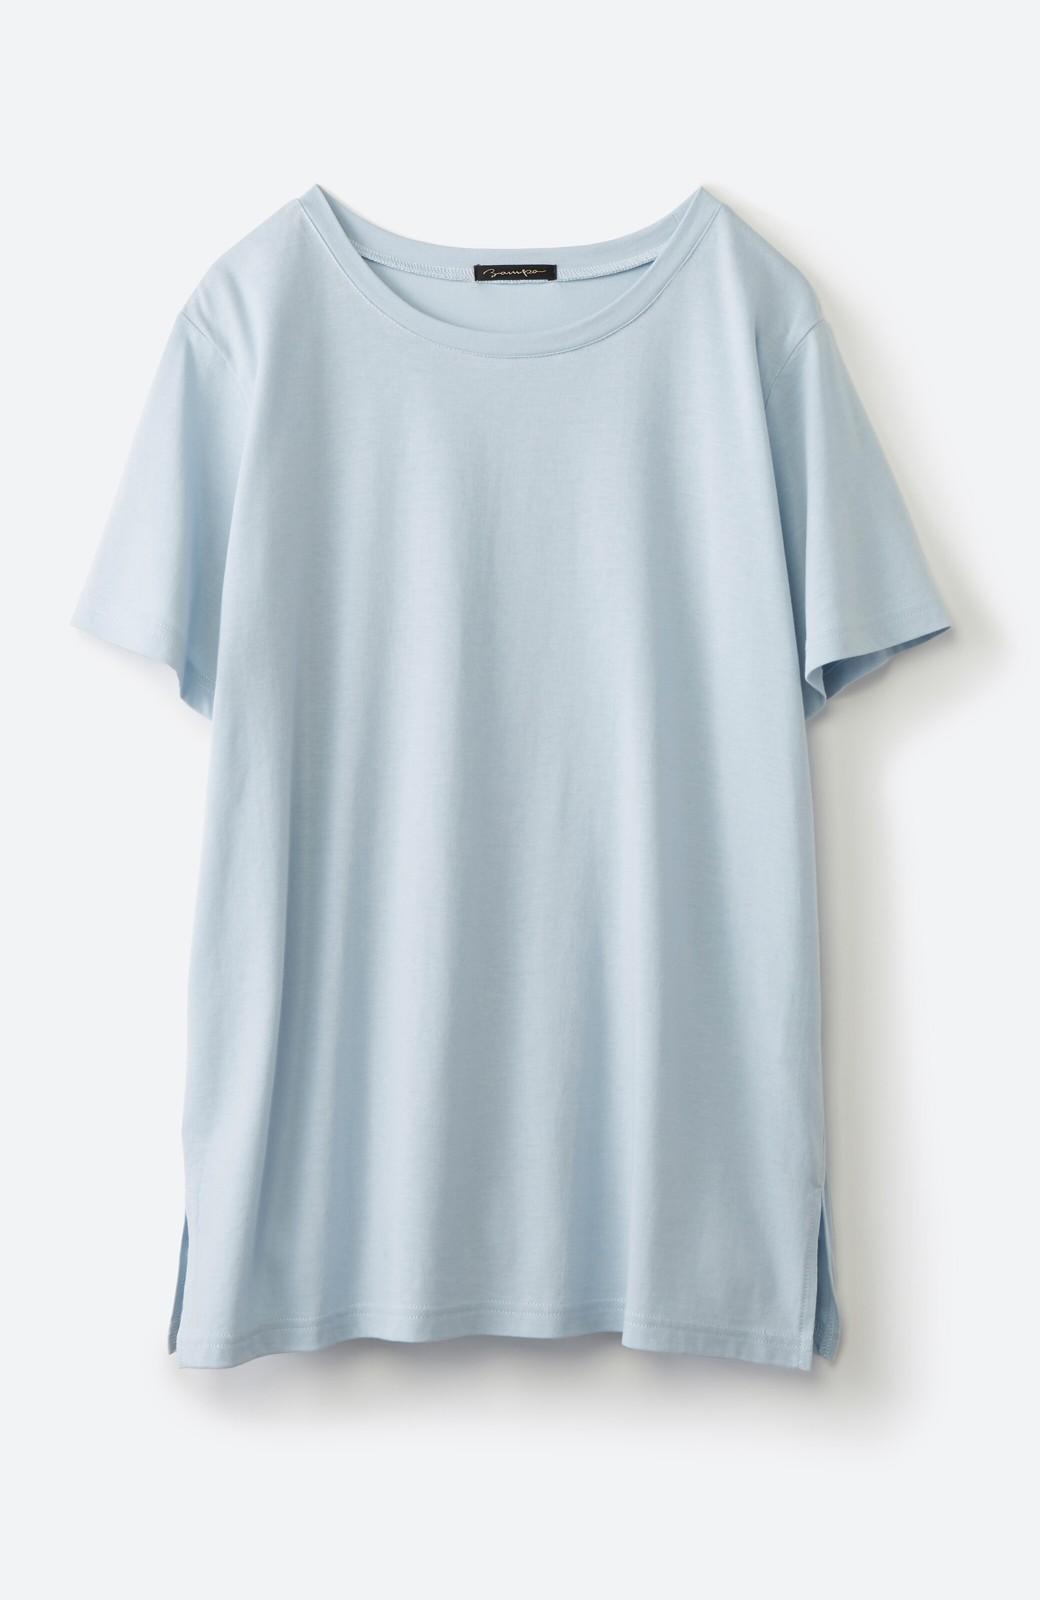 haco! 汗染み軽減加工で安心!1枚でも重ね着にも便利なシンプルTシャツ by ZAMPA <サックスブルー>の商品写真2